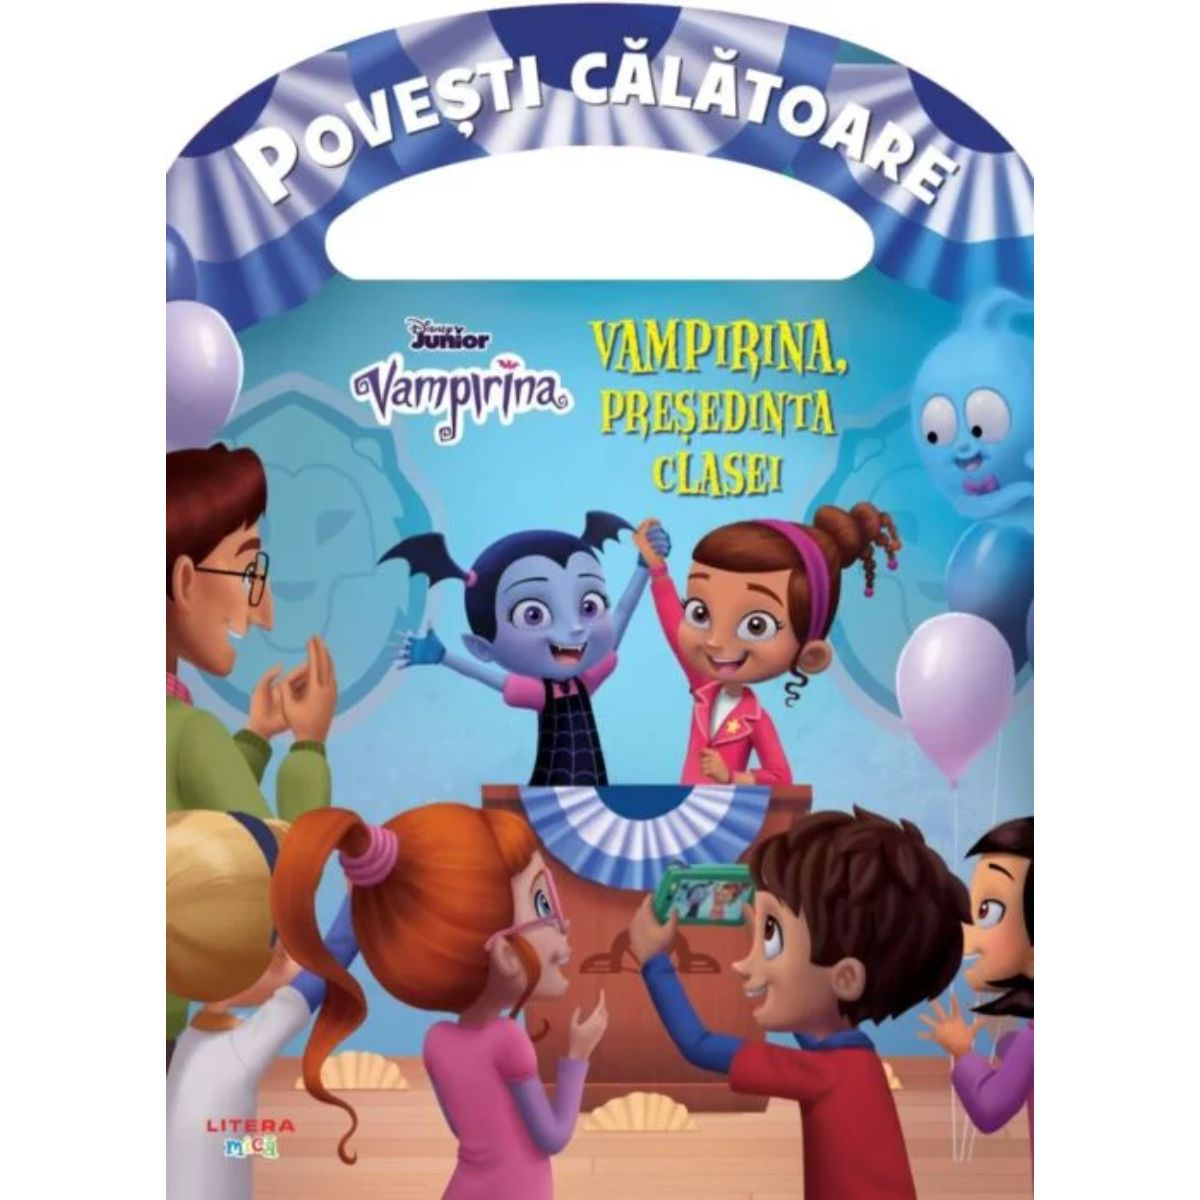 Disney Junior Vampirina, Vampirina, presedinta clasei